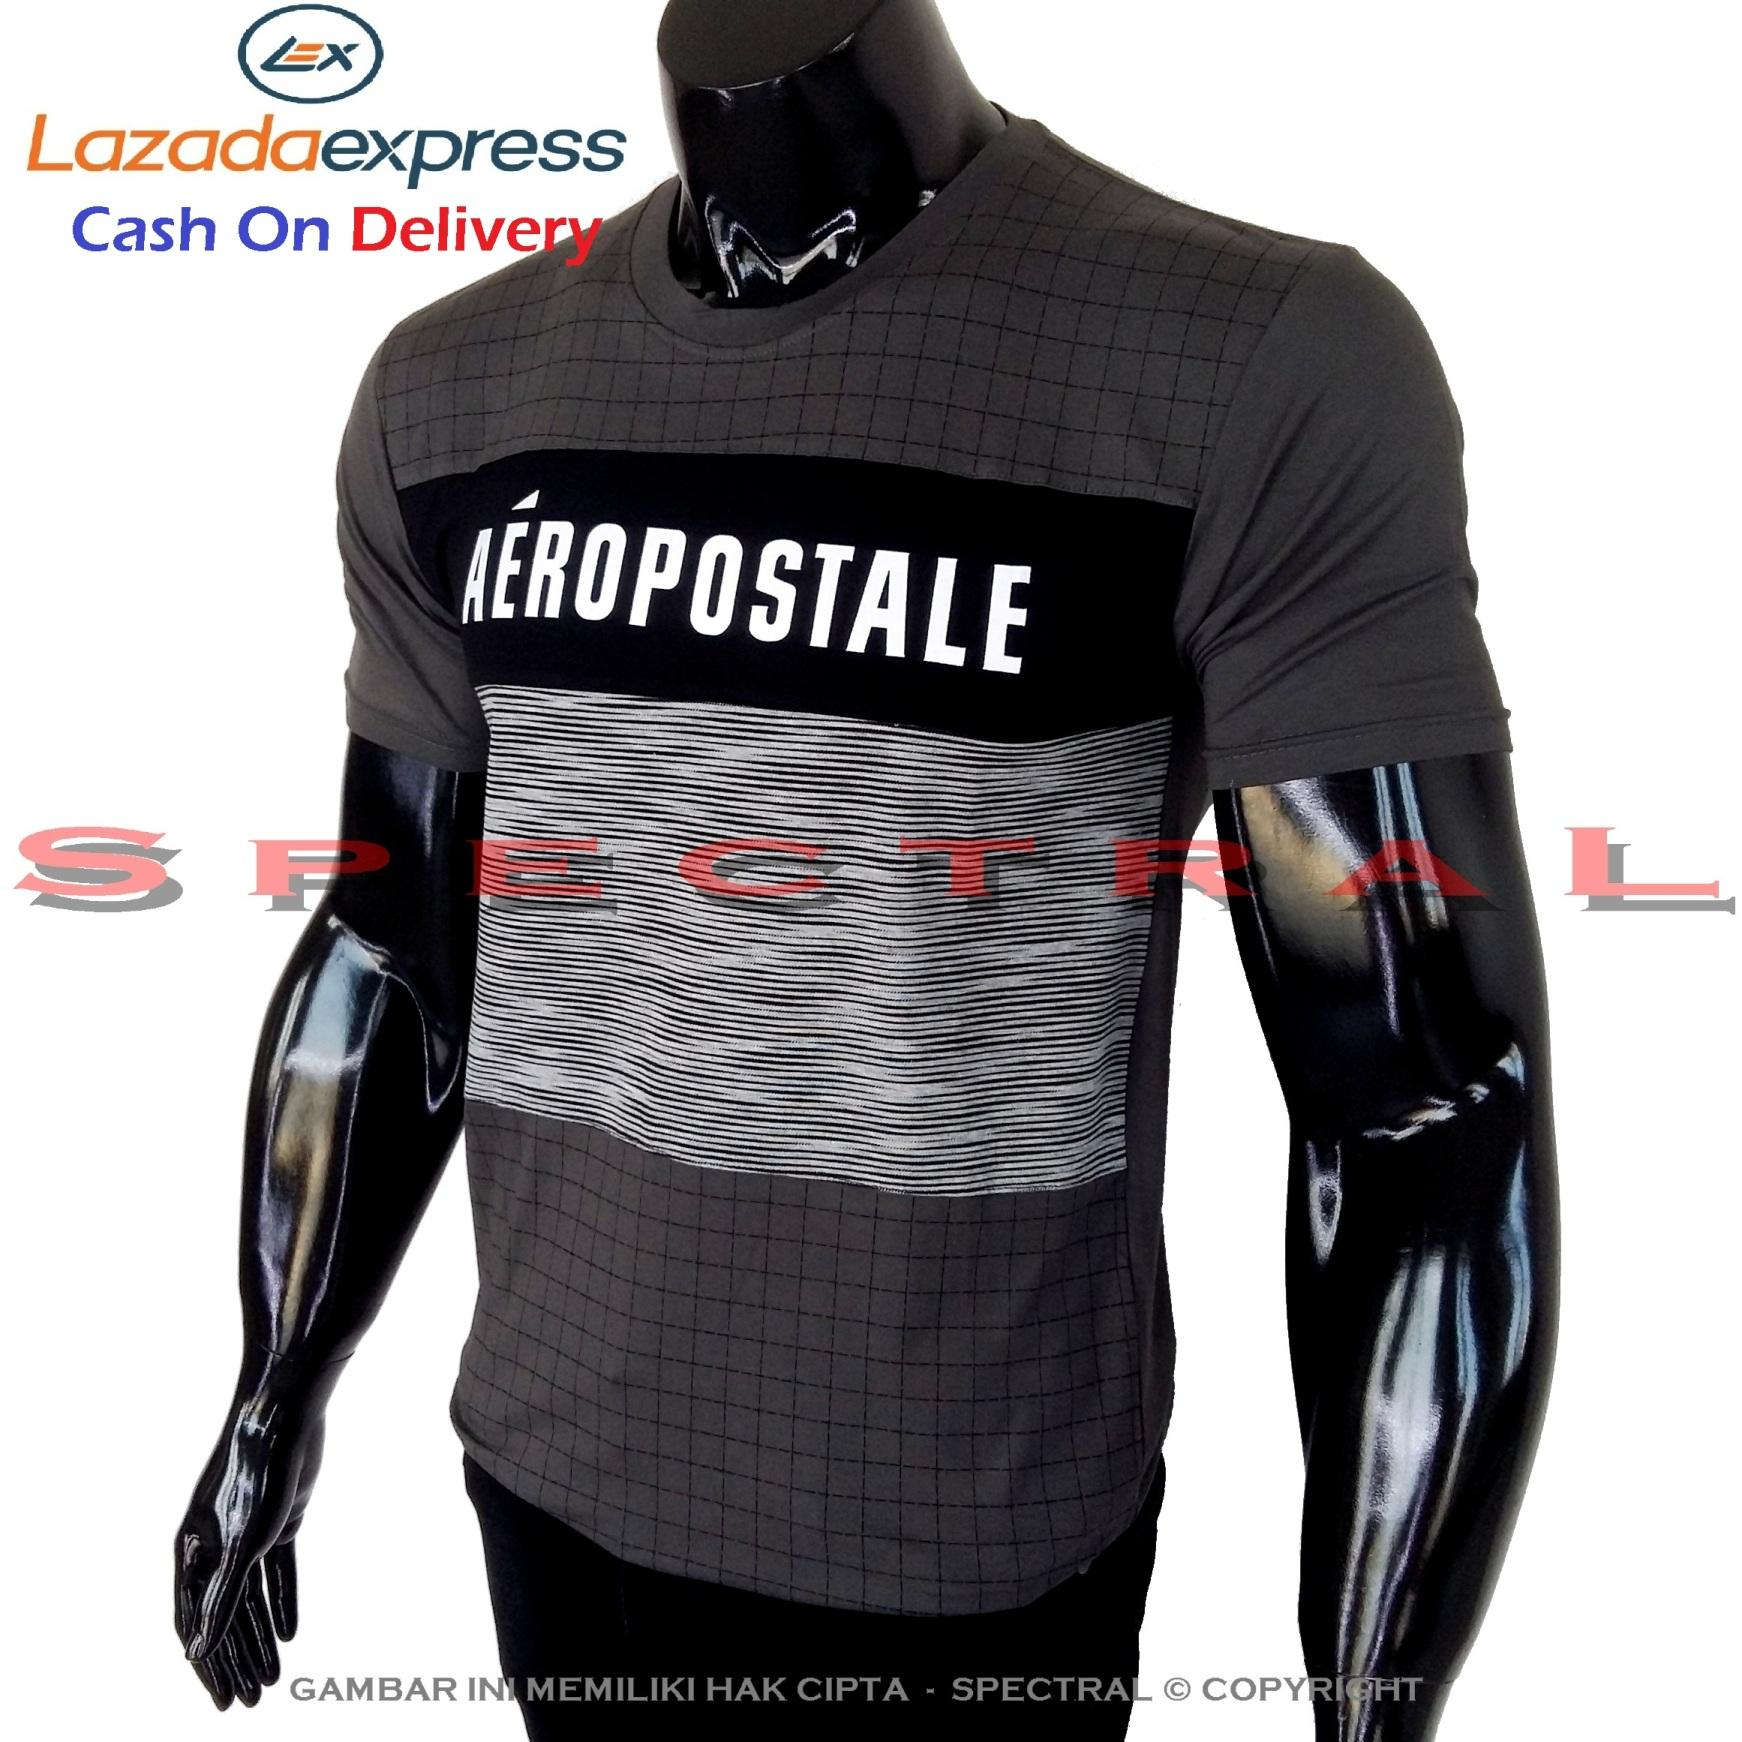 Spectral - Kaos Distro AEROPOSTALE Soft Rayon Viscose Lycra Pola M Fit To L Simple Fashionable Tidak Pasaran Kombinasi Garis Motif Art Visual